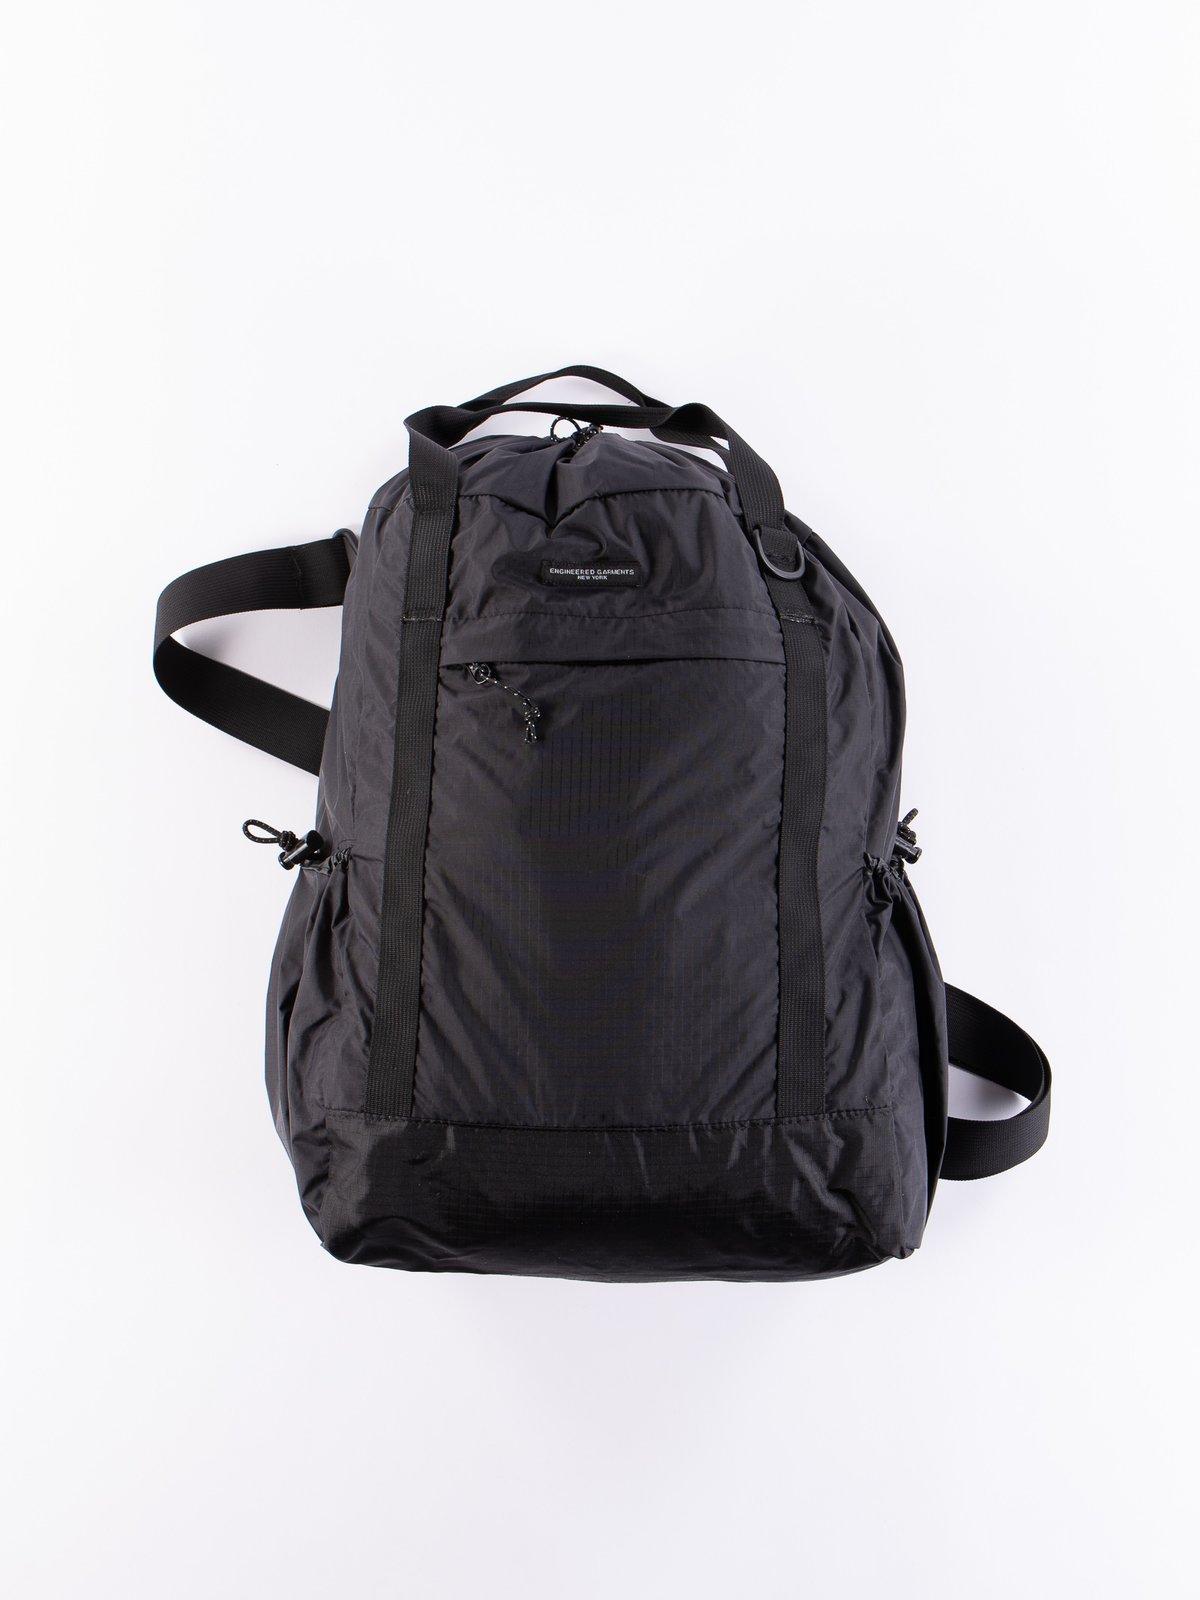 Black Nylon Ripstop UL 3 Way Bag - Image 1